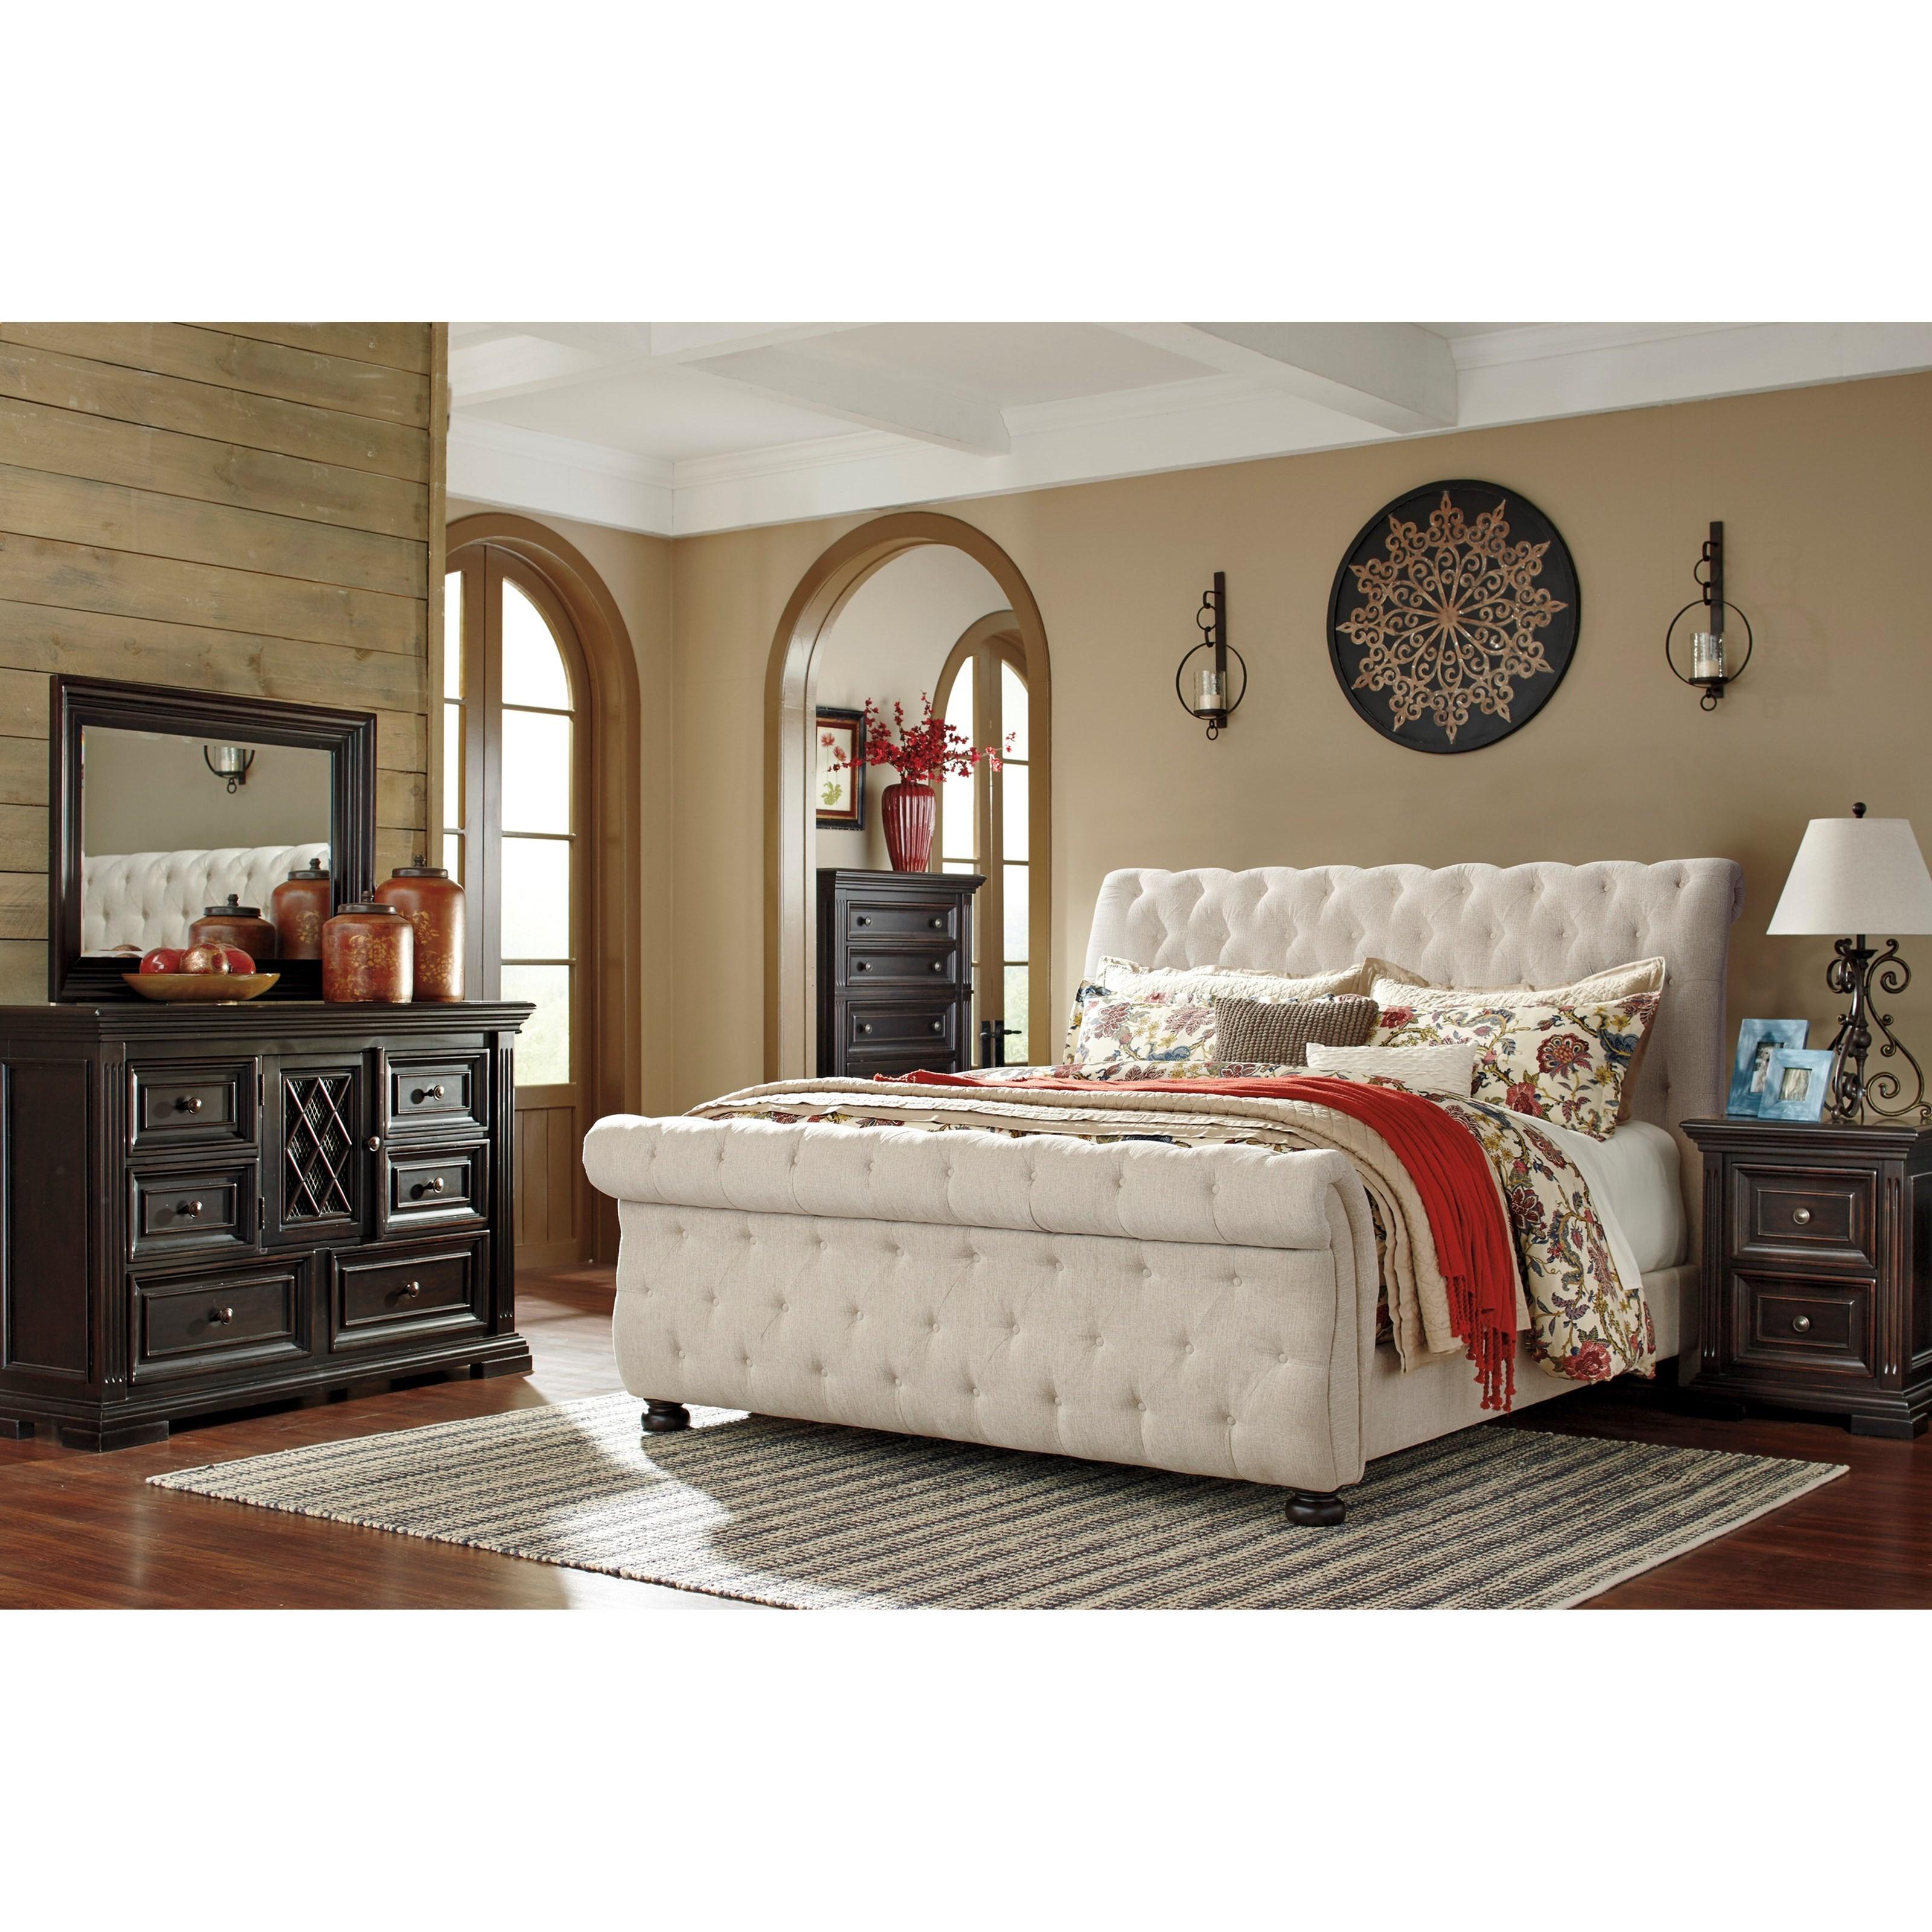 Signature Design By Ashley Willenburg Queen Bedroom Group Household Furnitu